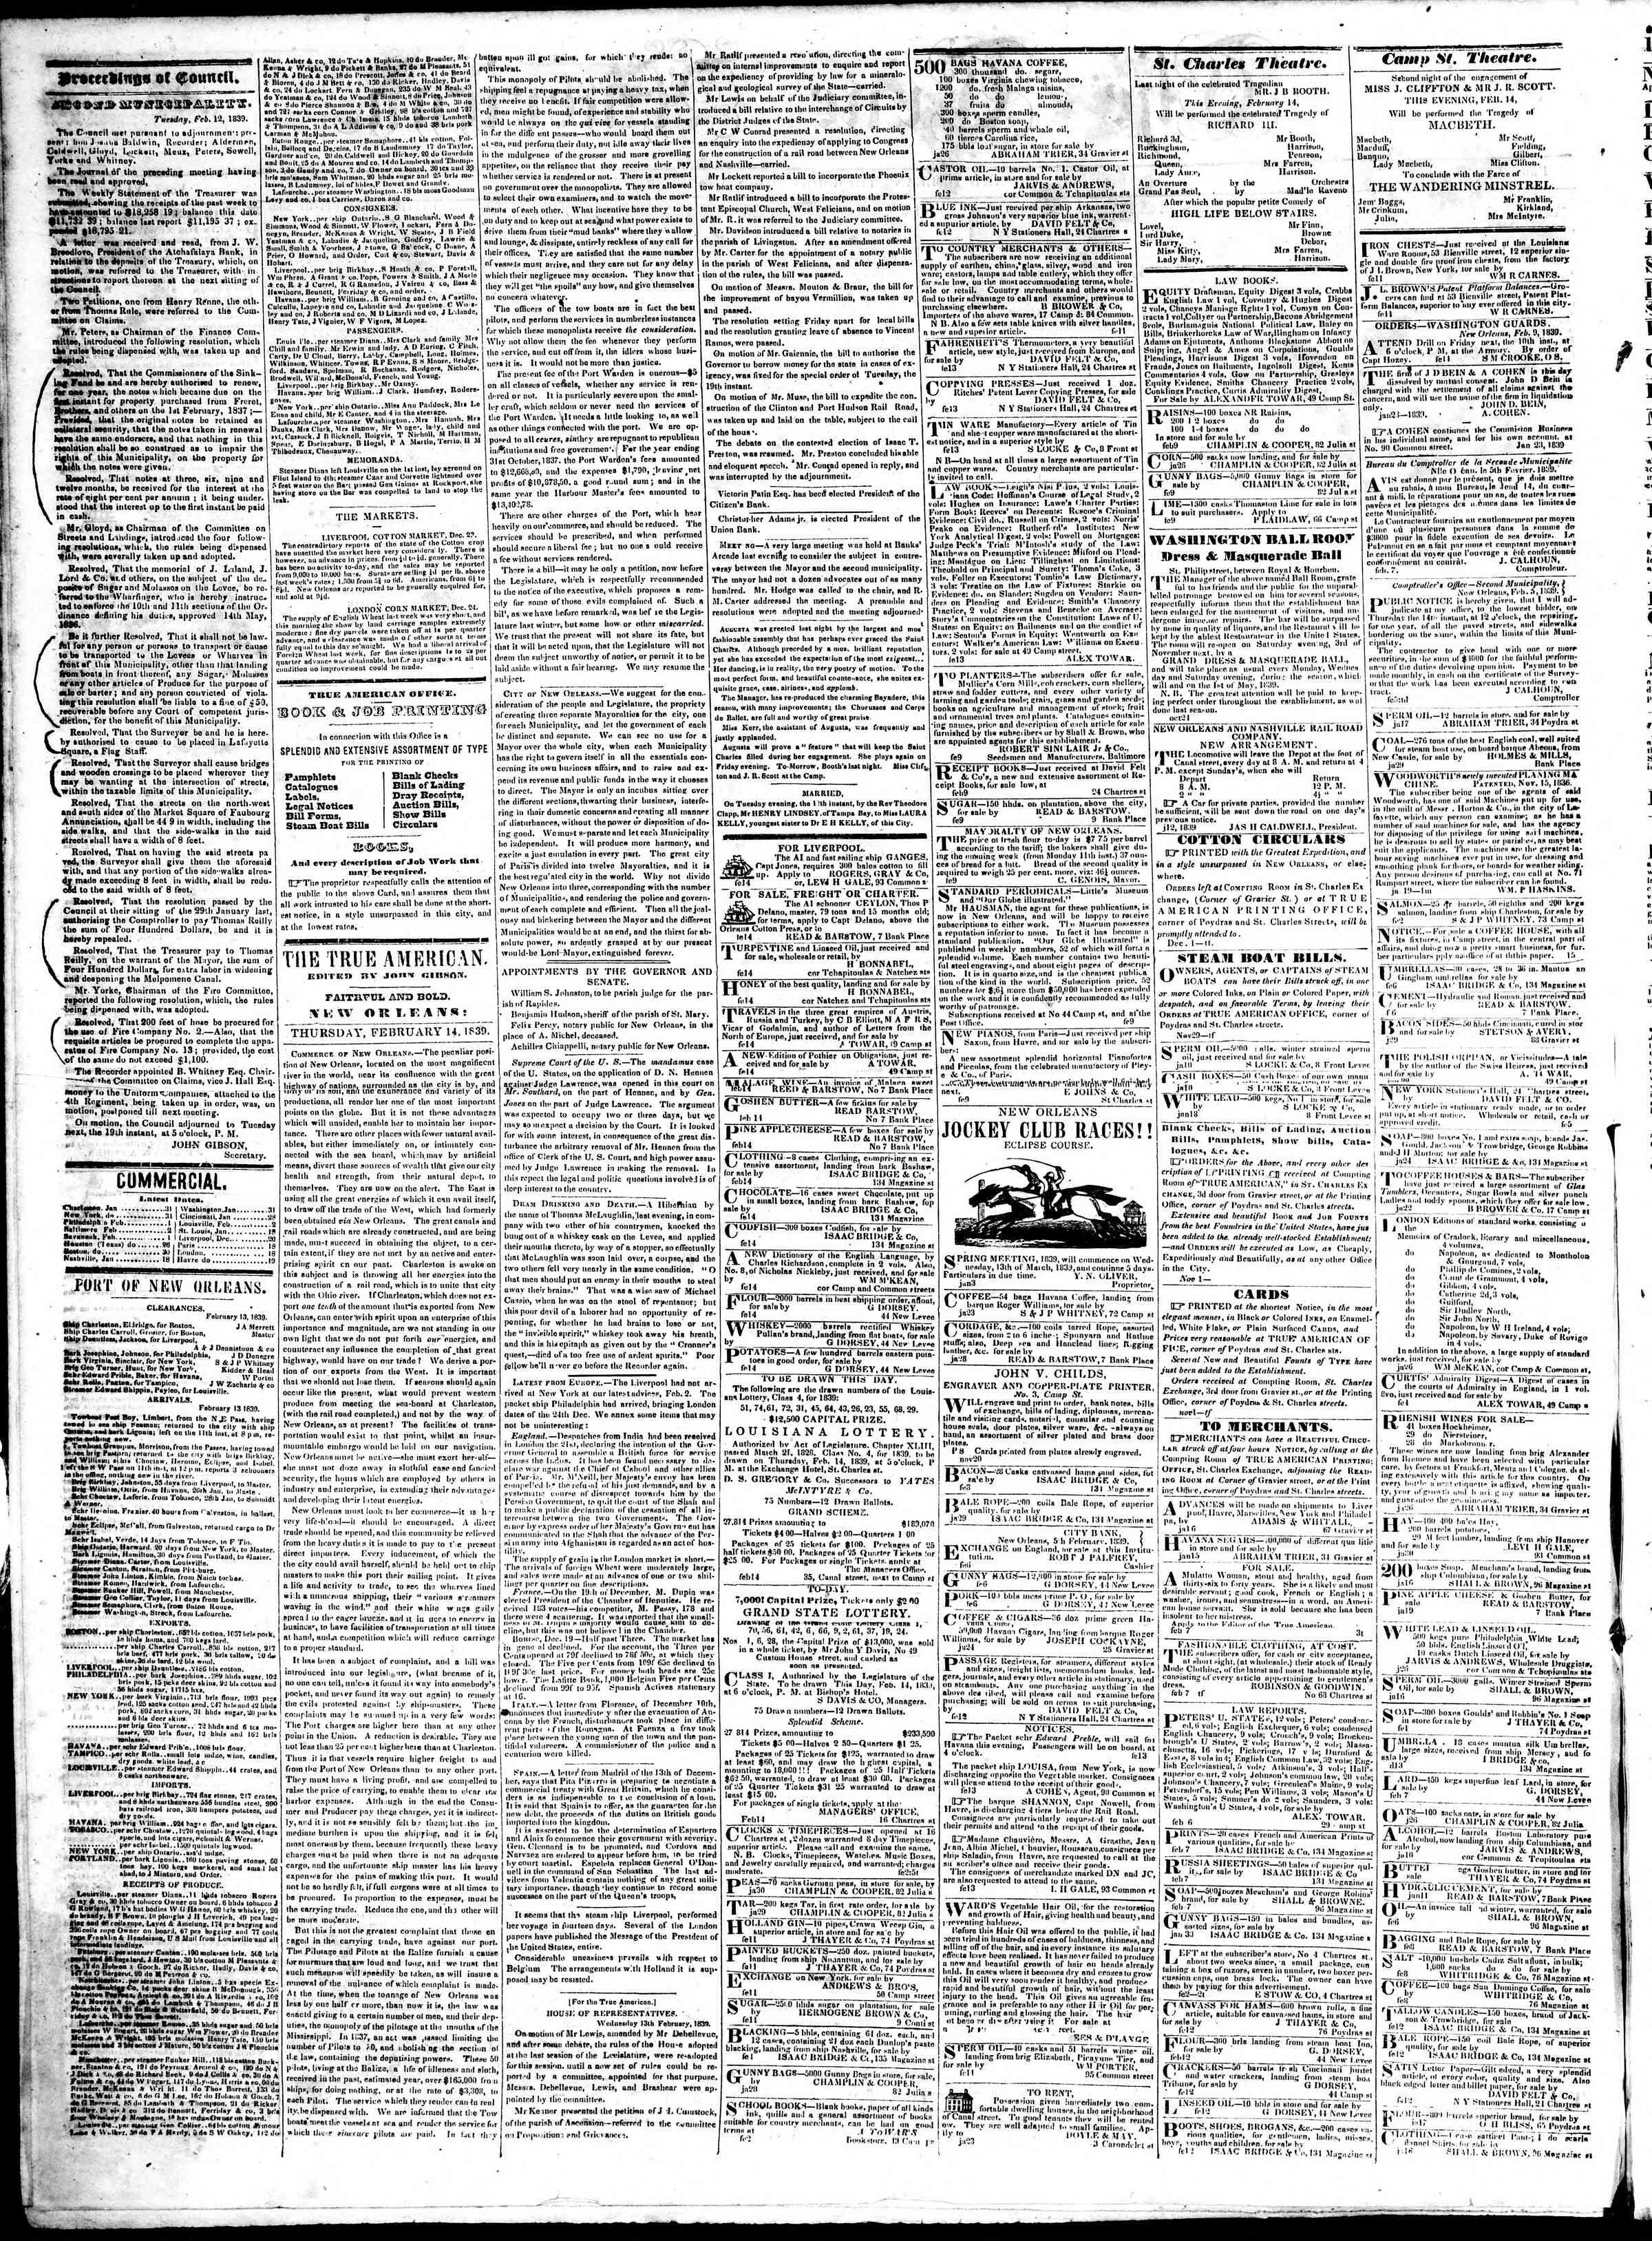 February 14, 1839 Tarihli True American Gazetesi Sayfa 2